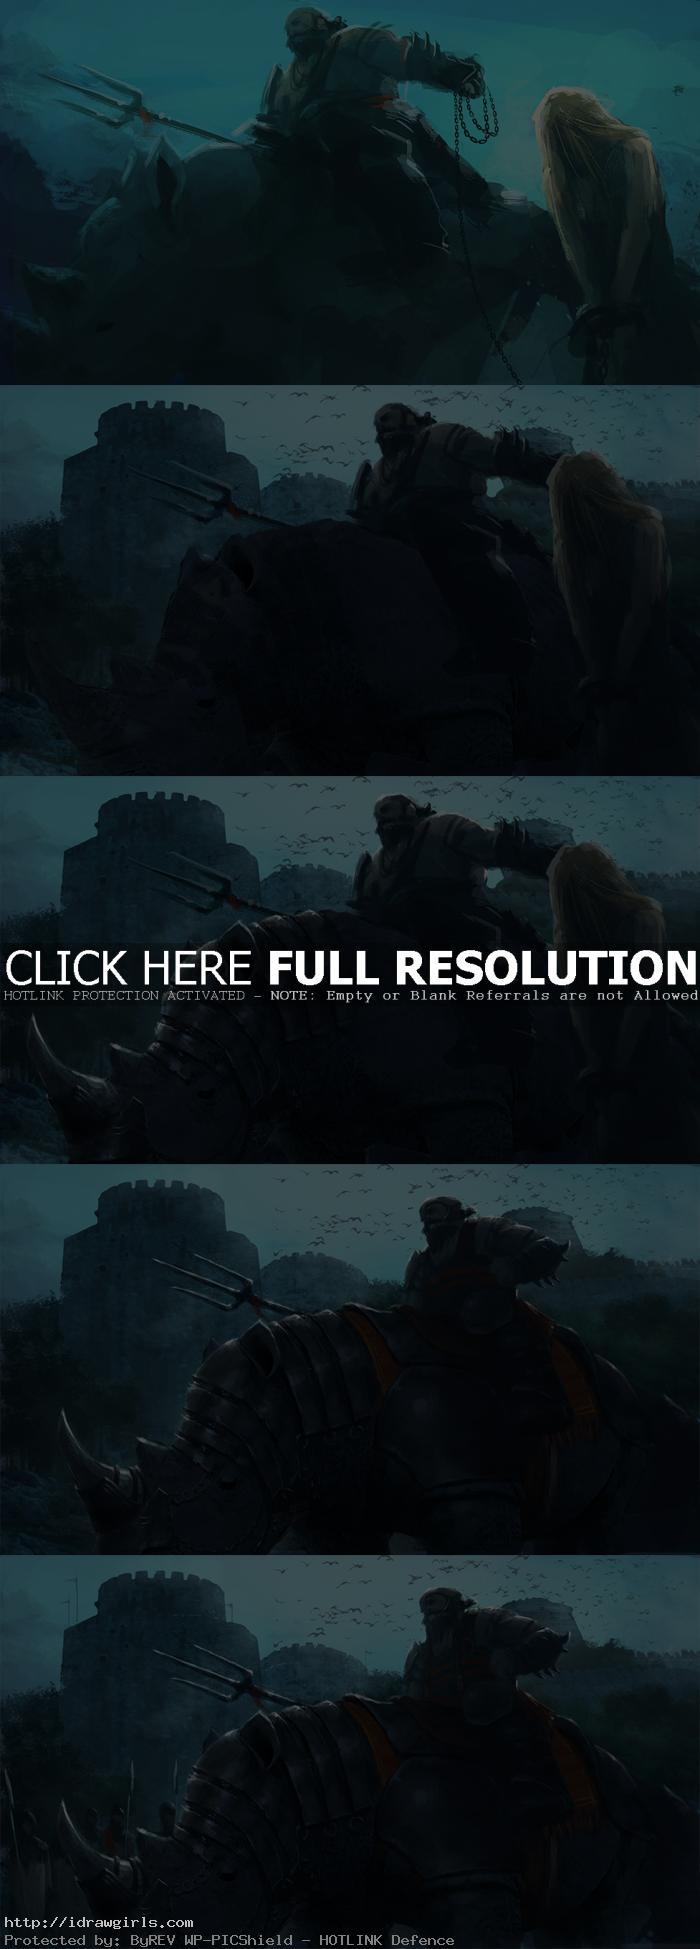 digital painting tutorial rhino knight 02